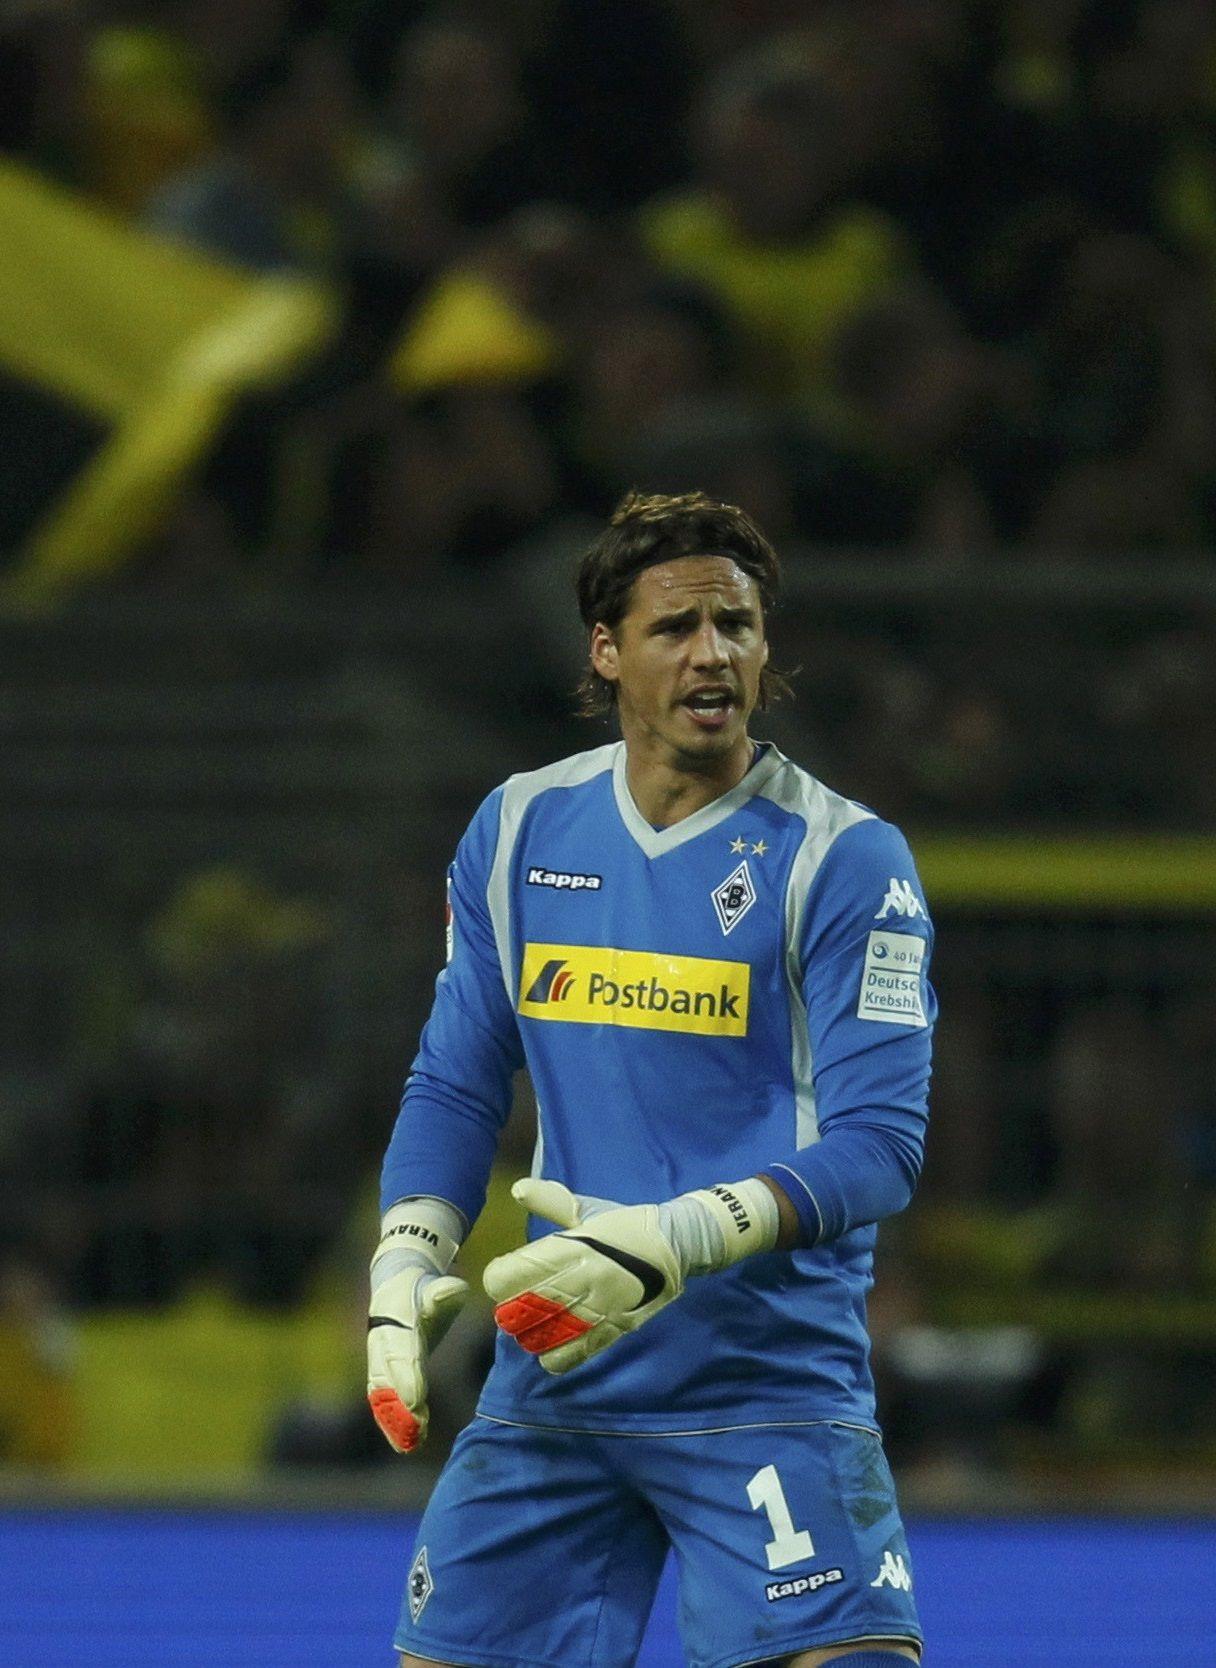 Bundesliga In Hq Different Sports Football Goalkeeper